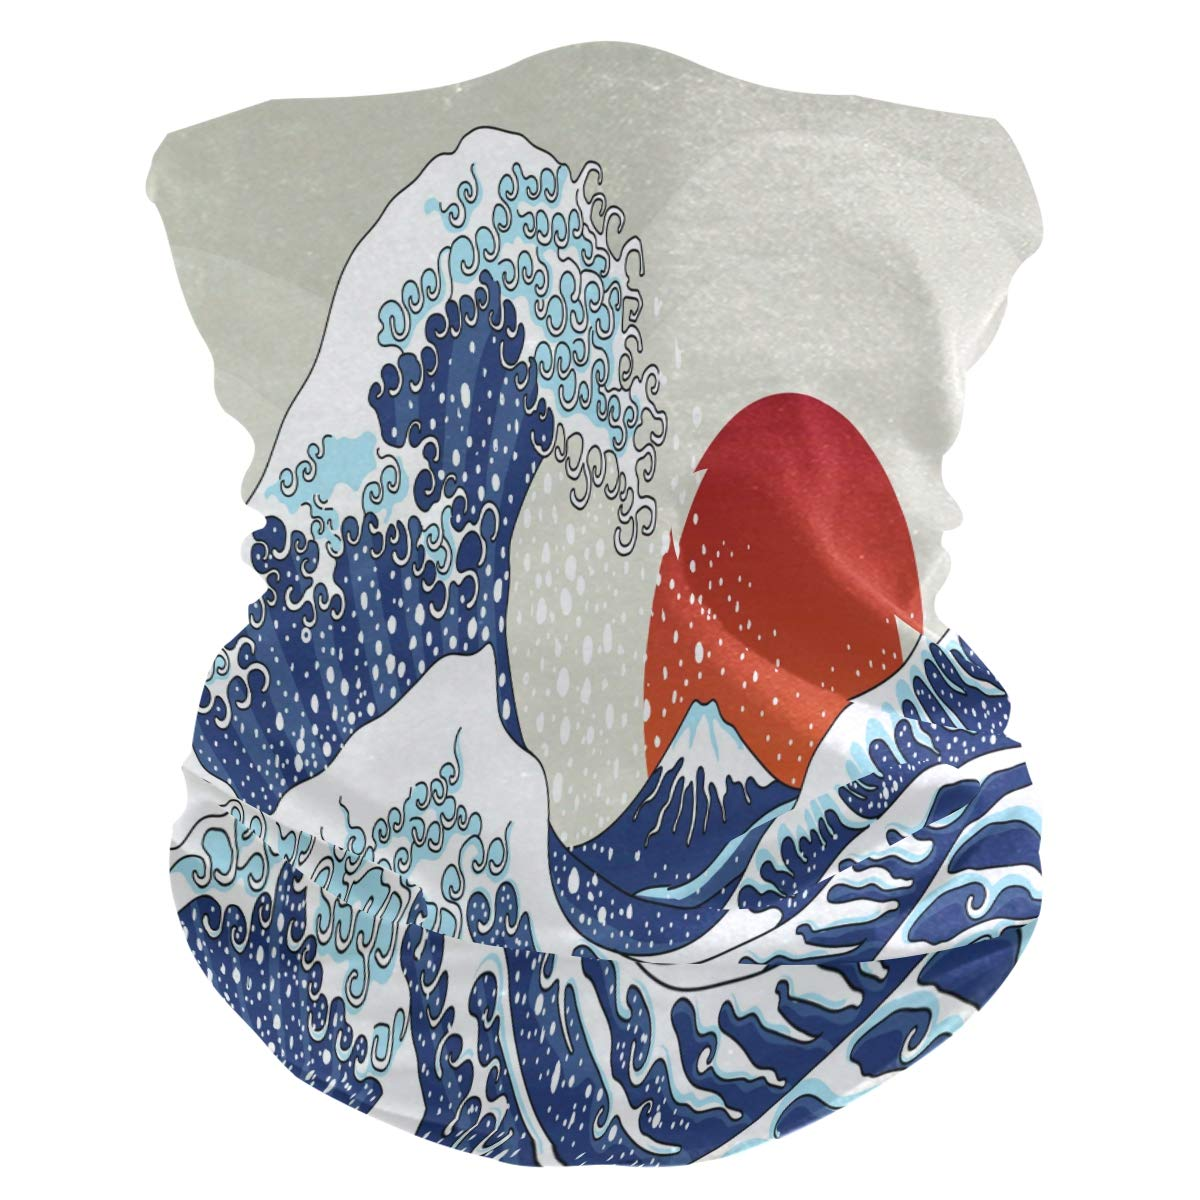 MAHU Headband Japanese Ocean Sunset Pattern Face UV Sun Protection Mask Neck Gaiter Magic Scarf Bandana Headwear Balaclava for Women Men